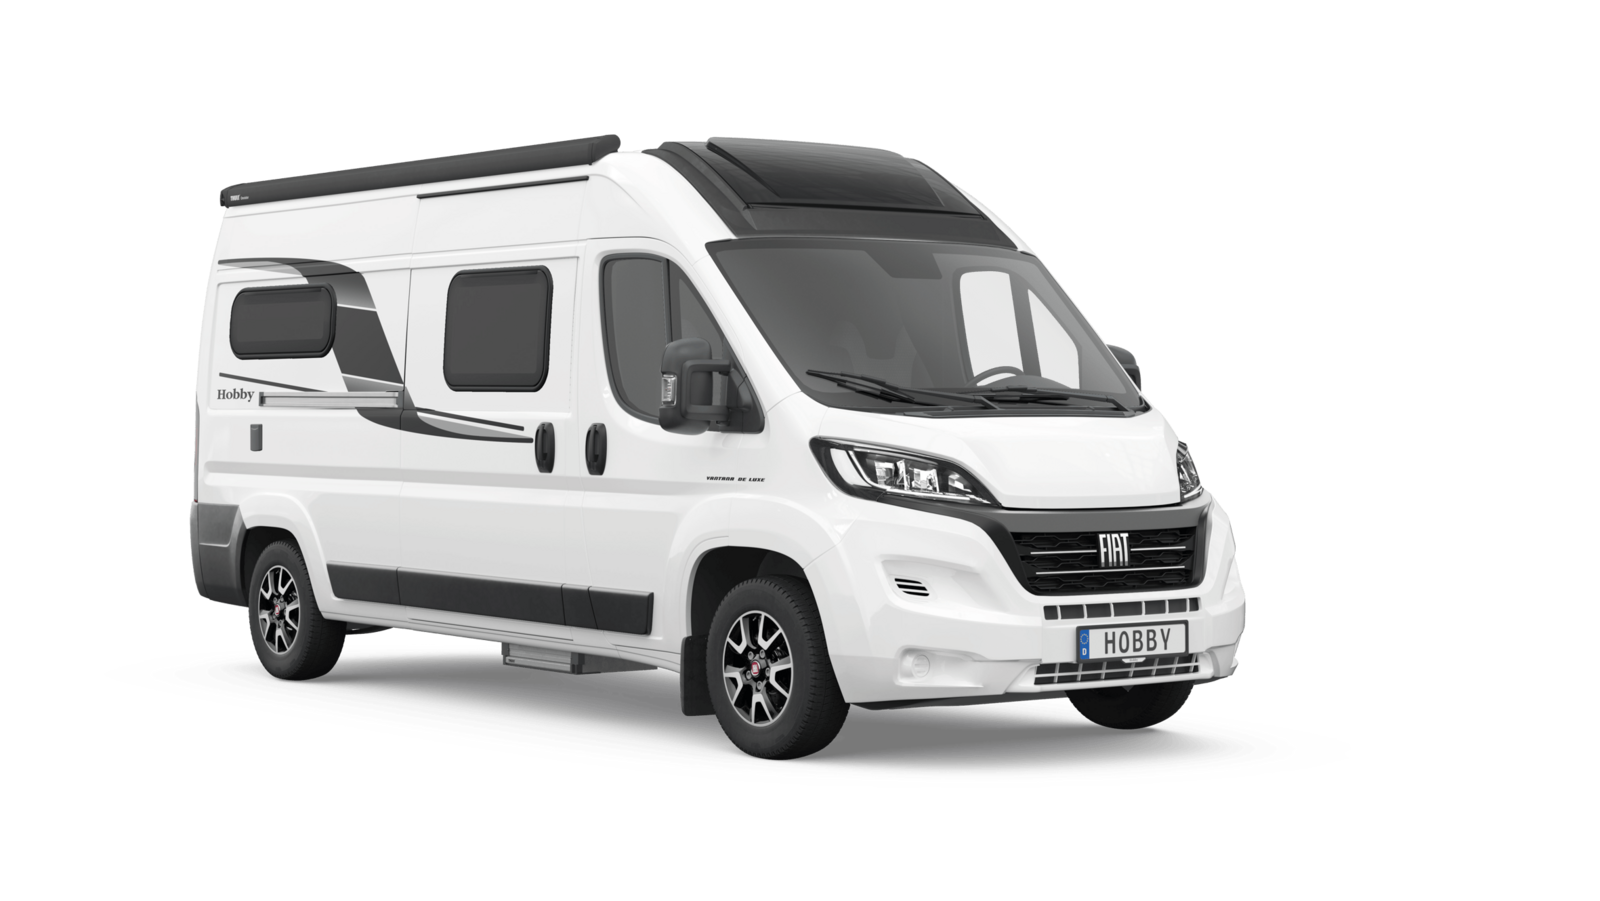 2022-KW-Freisteller-Bug-Vantana-De-Luxe-K60-FT-weiss-Rahmenfenster-PRESSE-lowres